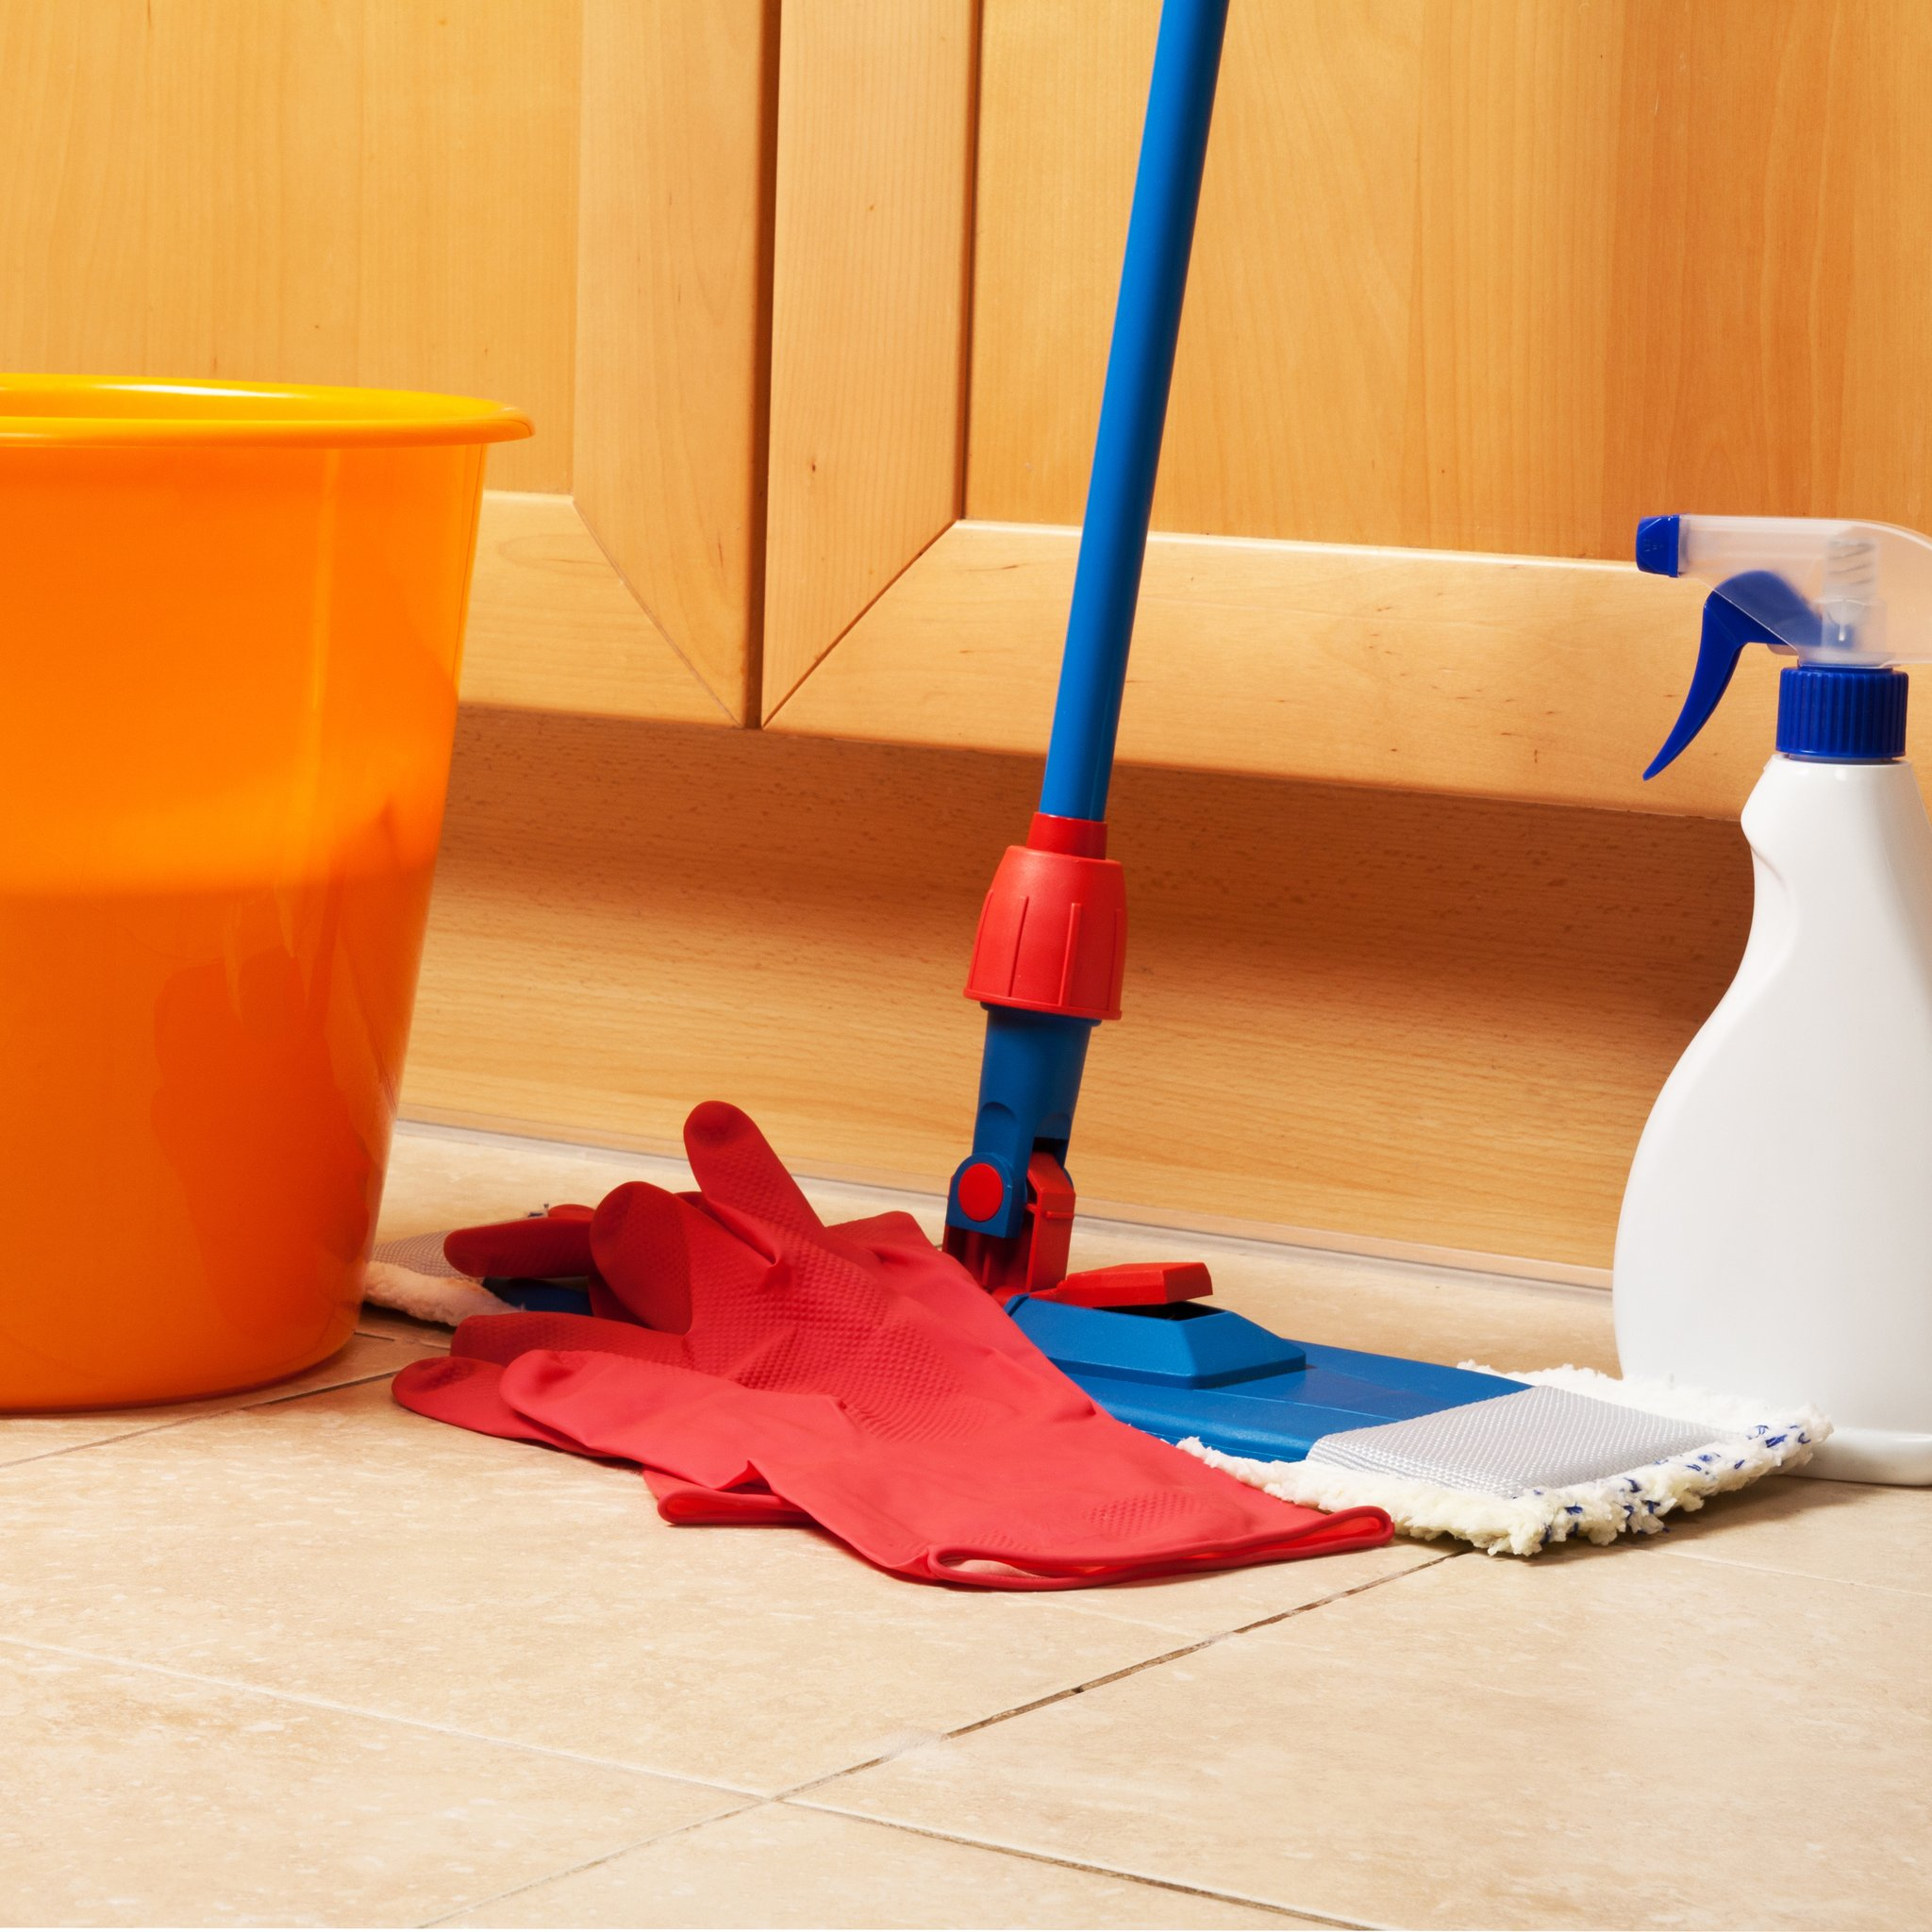 ceramic tile floors mop bucket